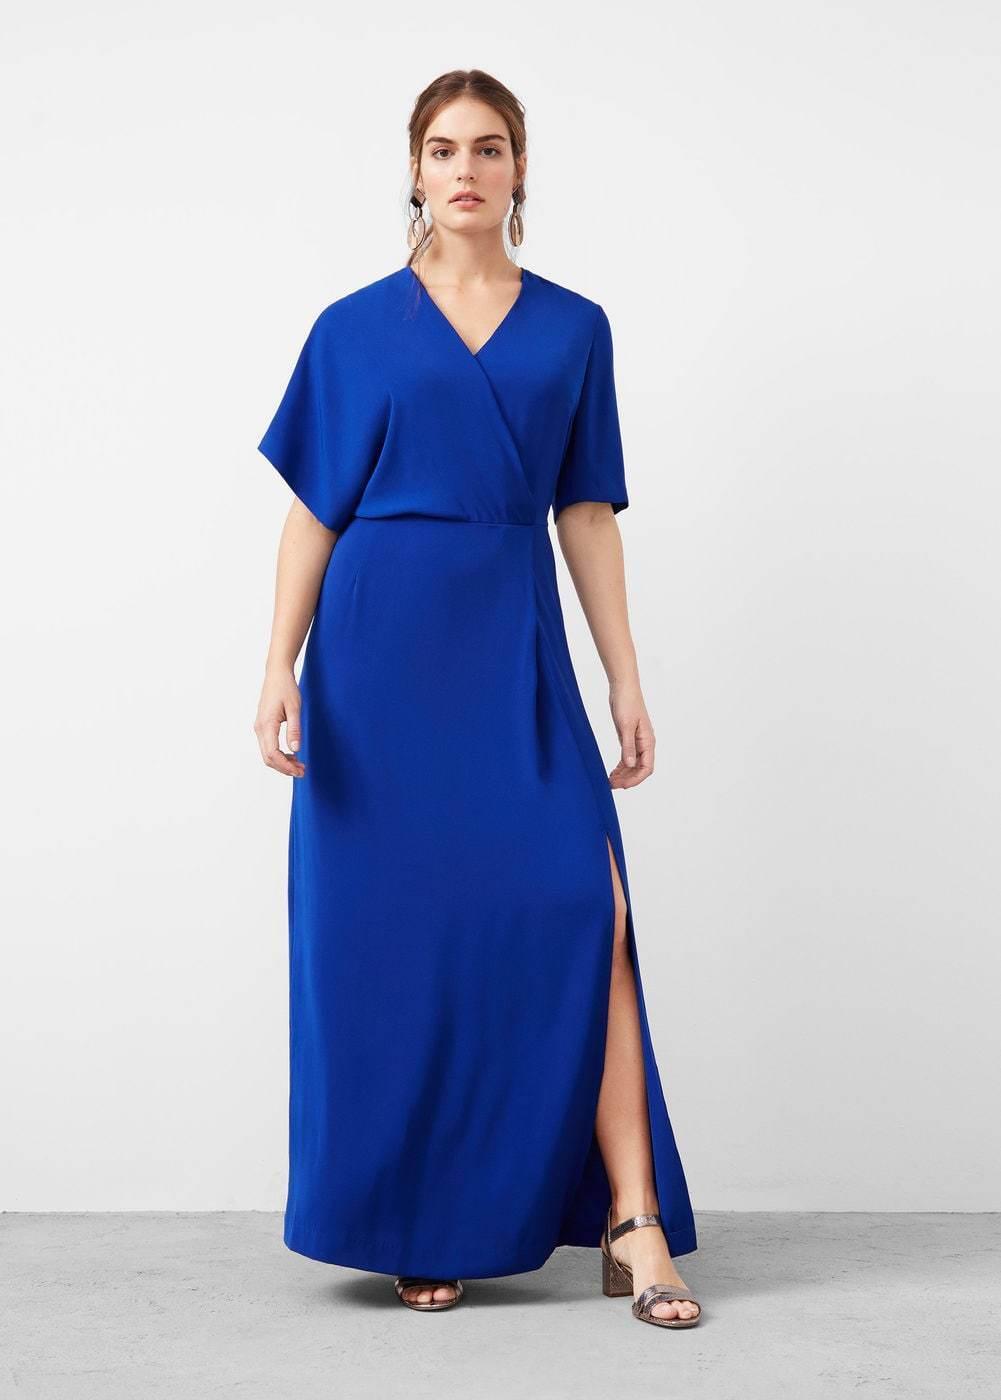 Mango Draped Detail Dress bluee Size LF076 NN 08